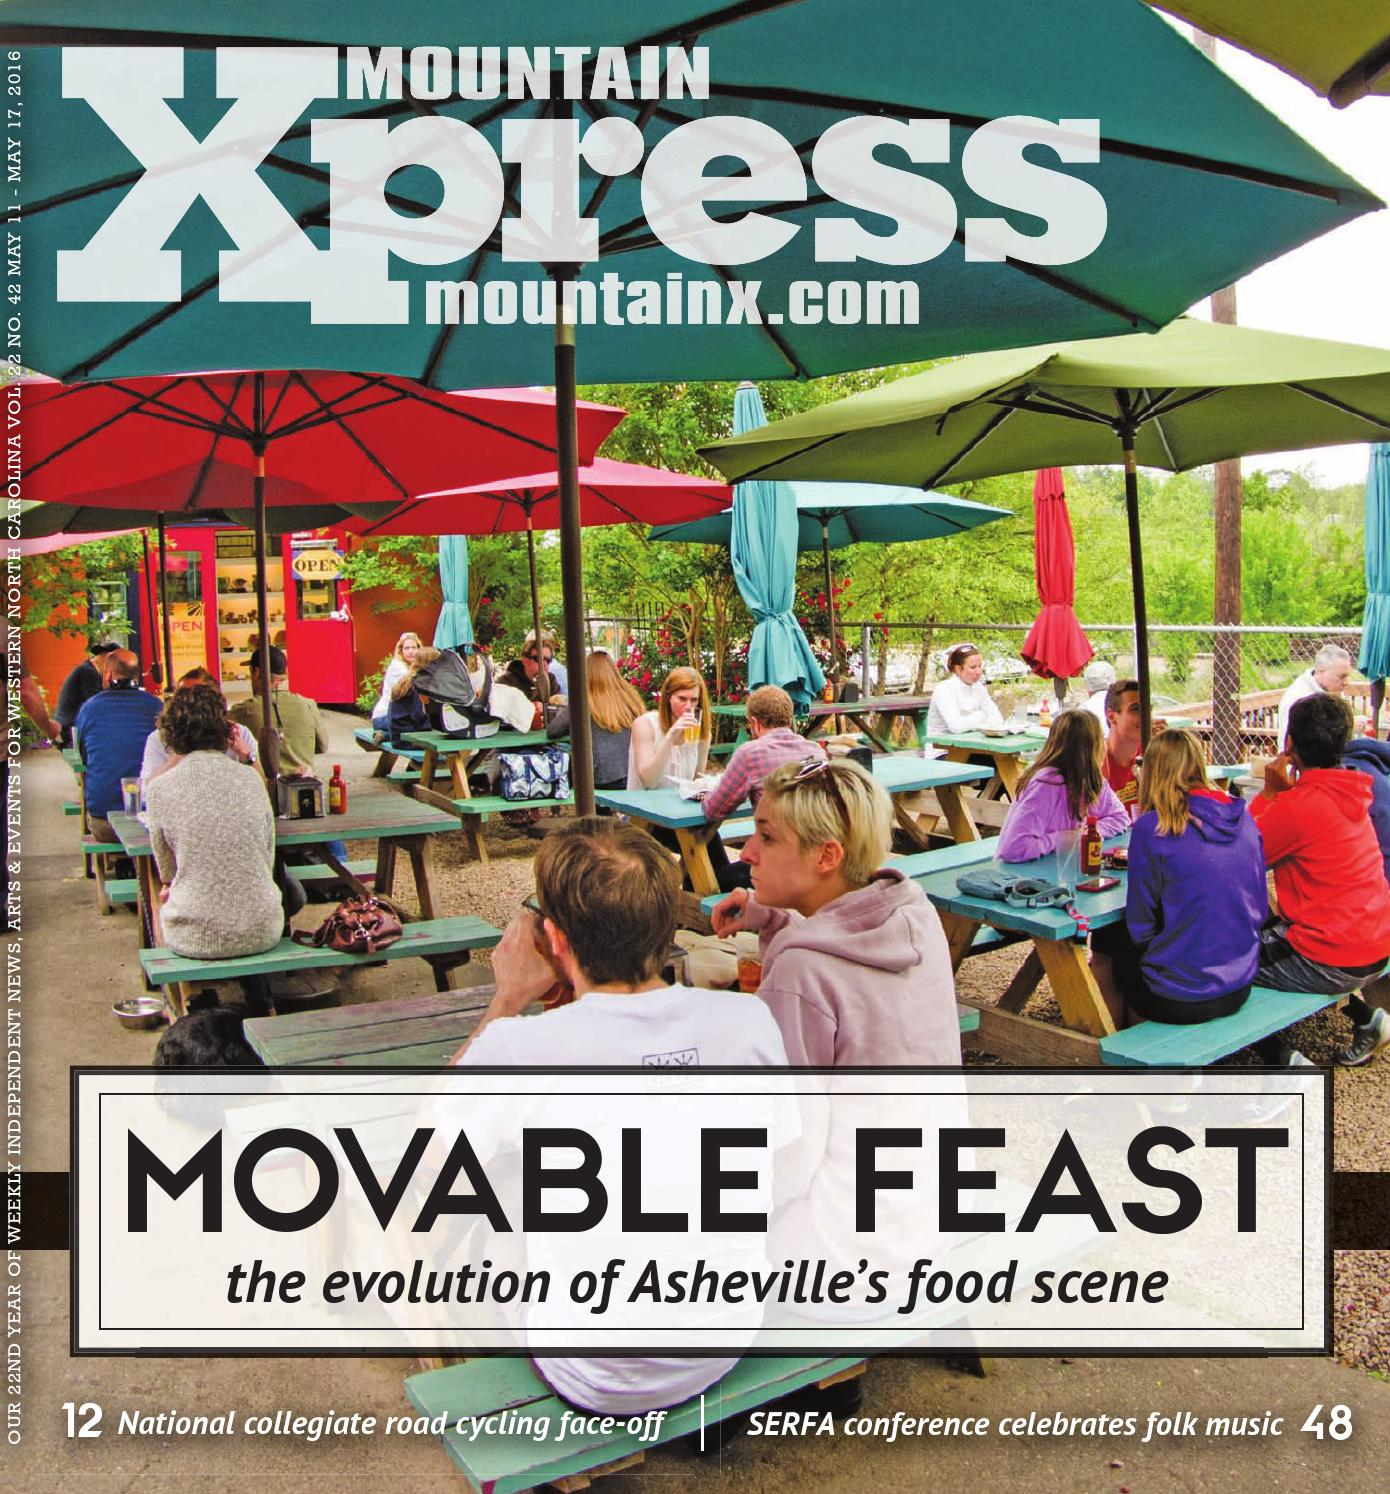 Mountain Xpress 05 11 16 by Mountain Xpress - issuu